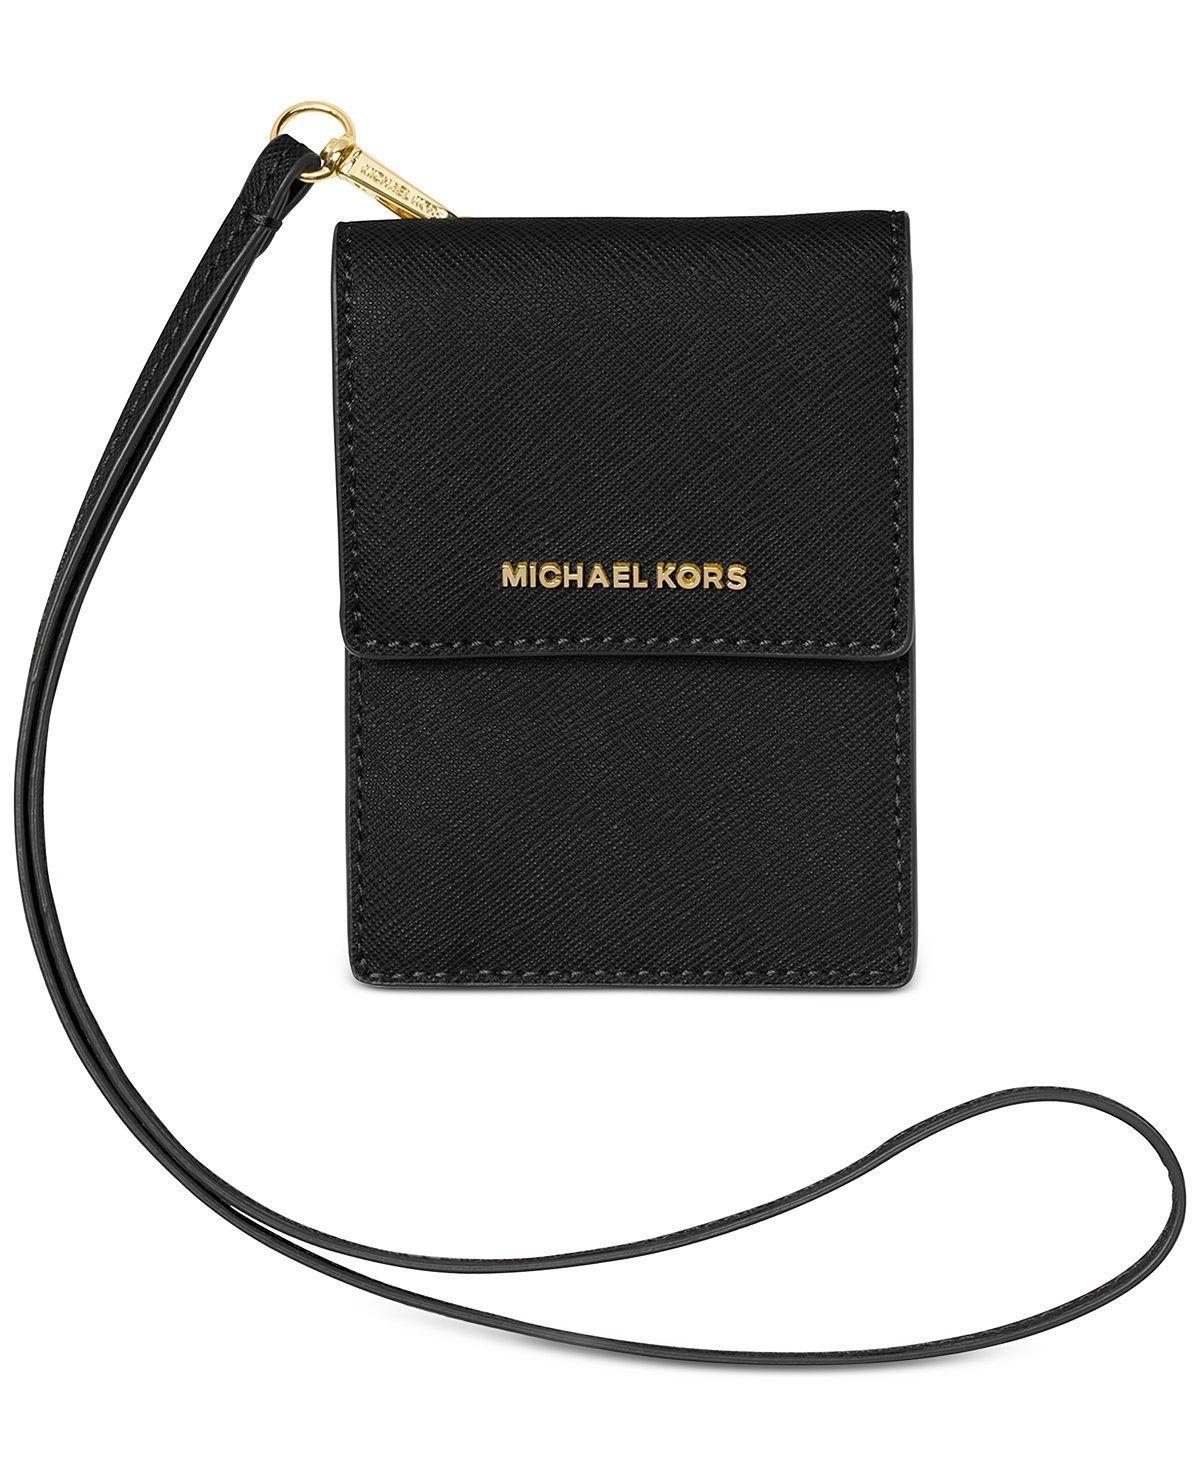 122183101239 57. 57. Previous. Michael Kors Lanyard Card Case Leather wallet Jet Set  Travel Black NWT